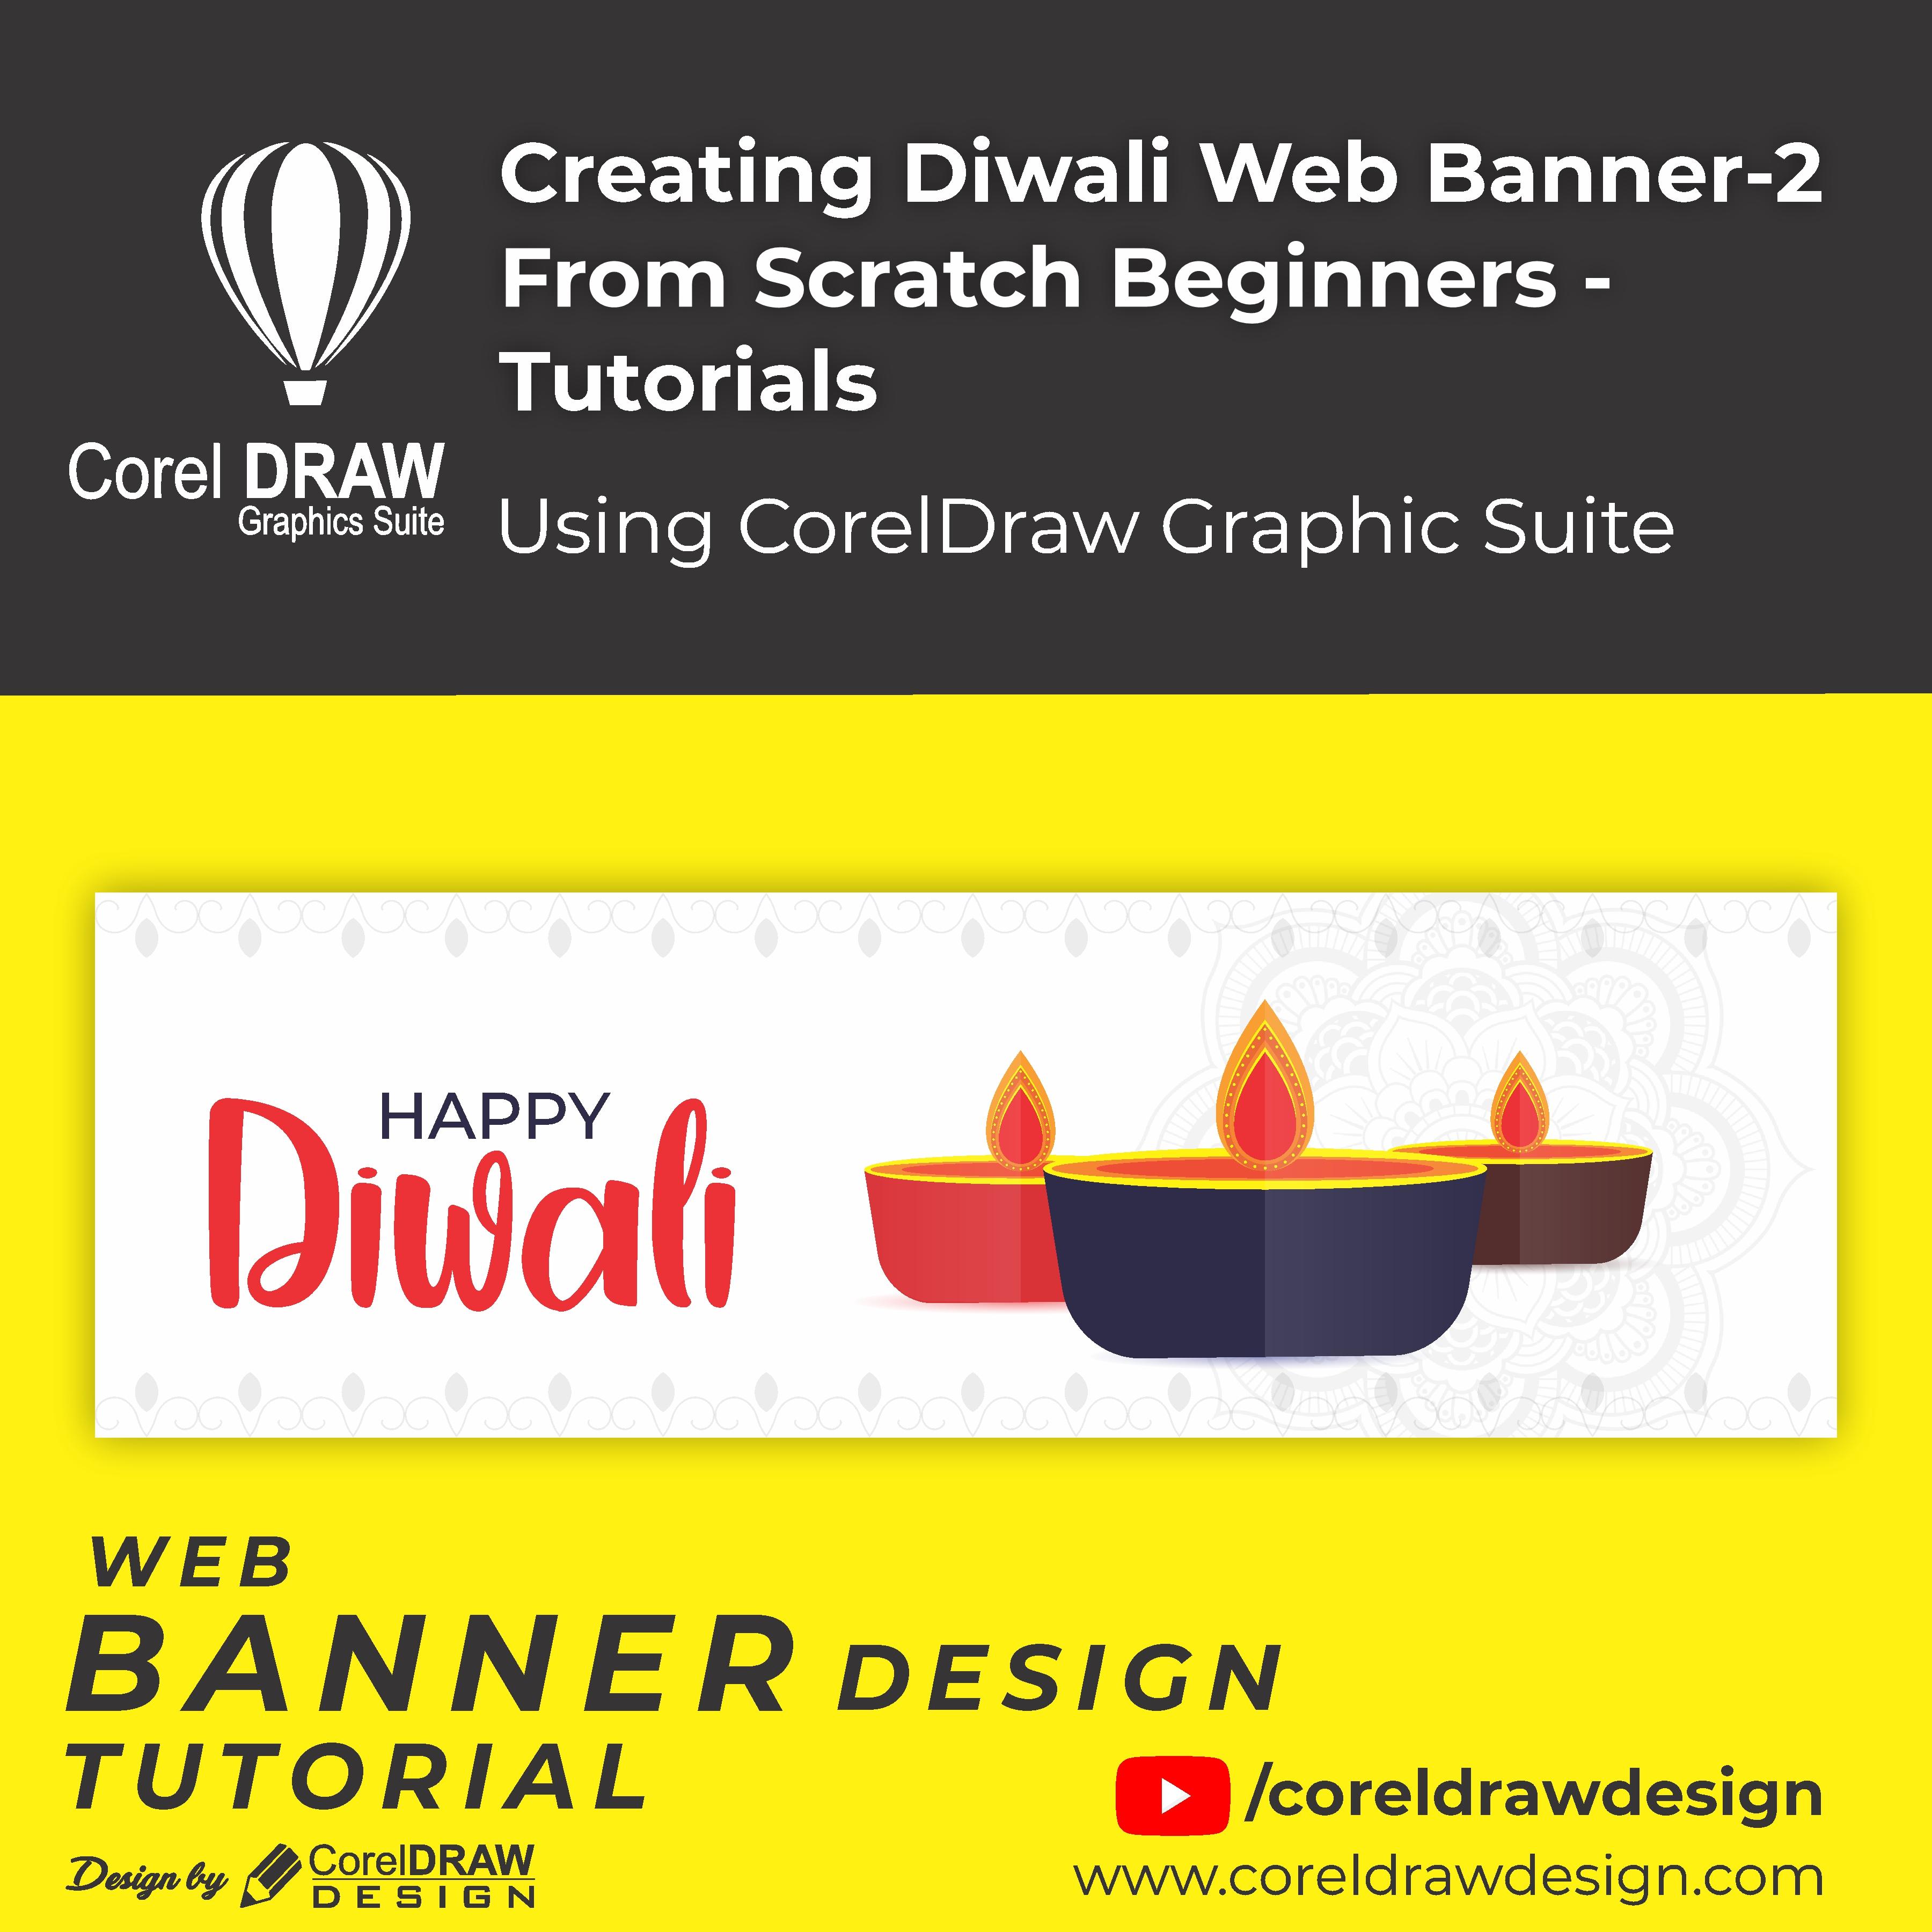 Creating - Creative Diwali web banner 2 - Digital Graphics - Tutorial Coreldraw for Beginners